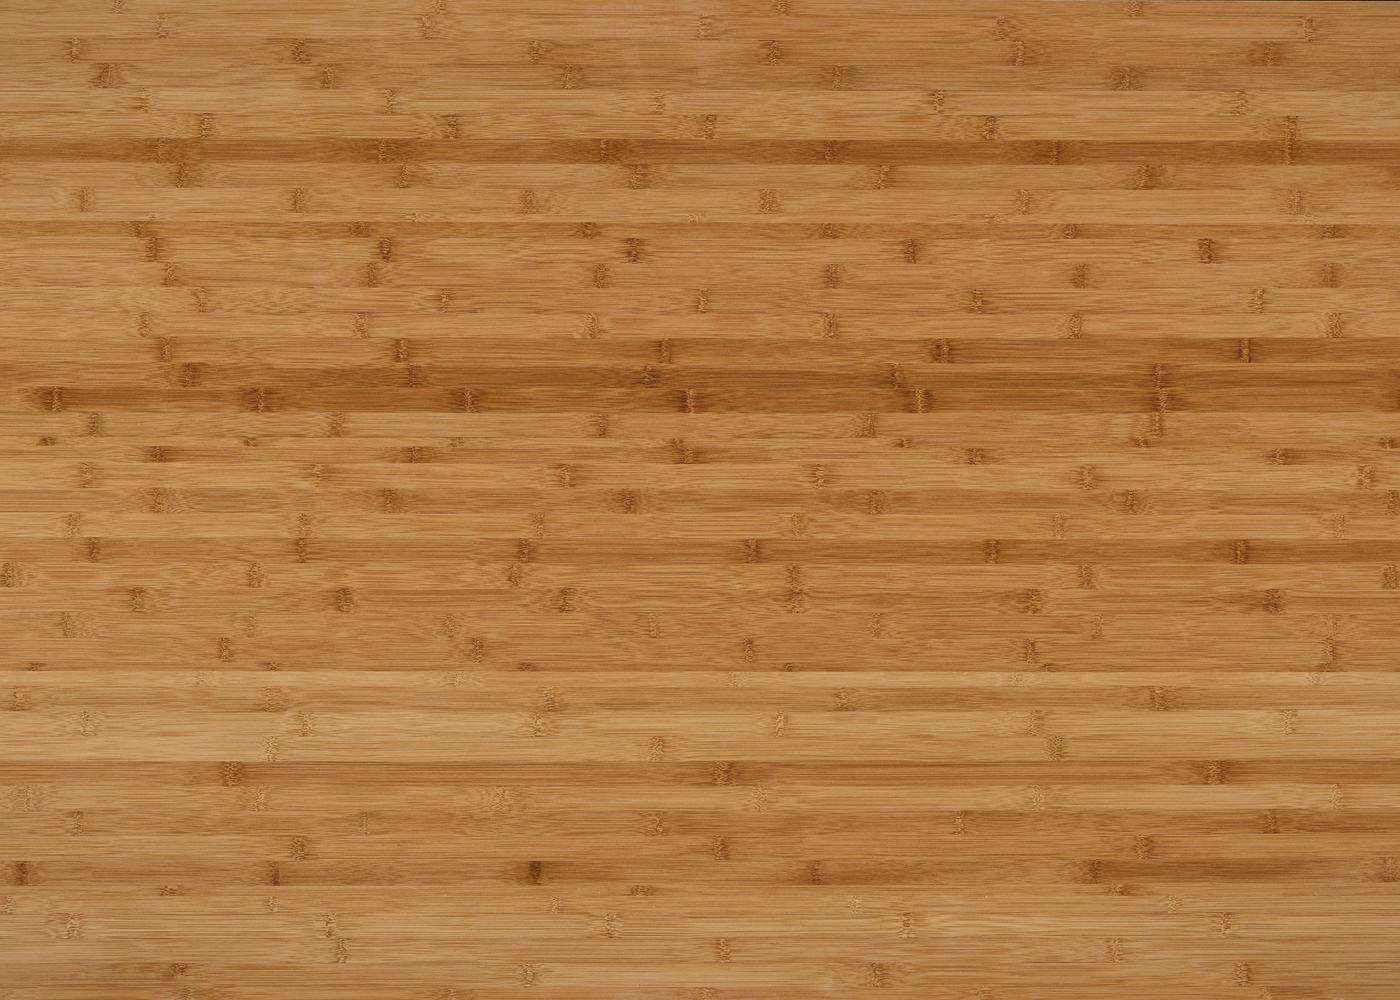 Parquet bambou massif Café Horizontal 2 plis vernis 10x95x970